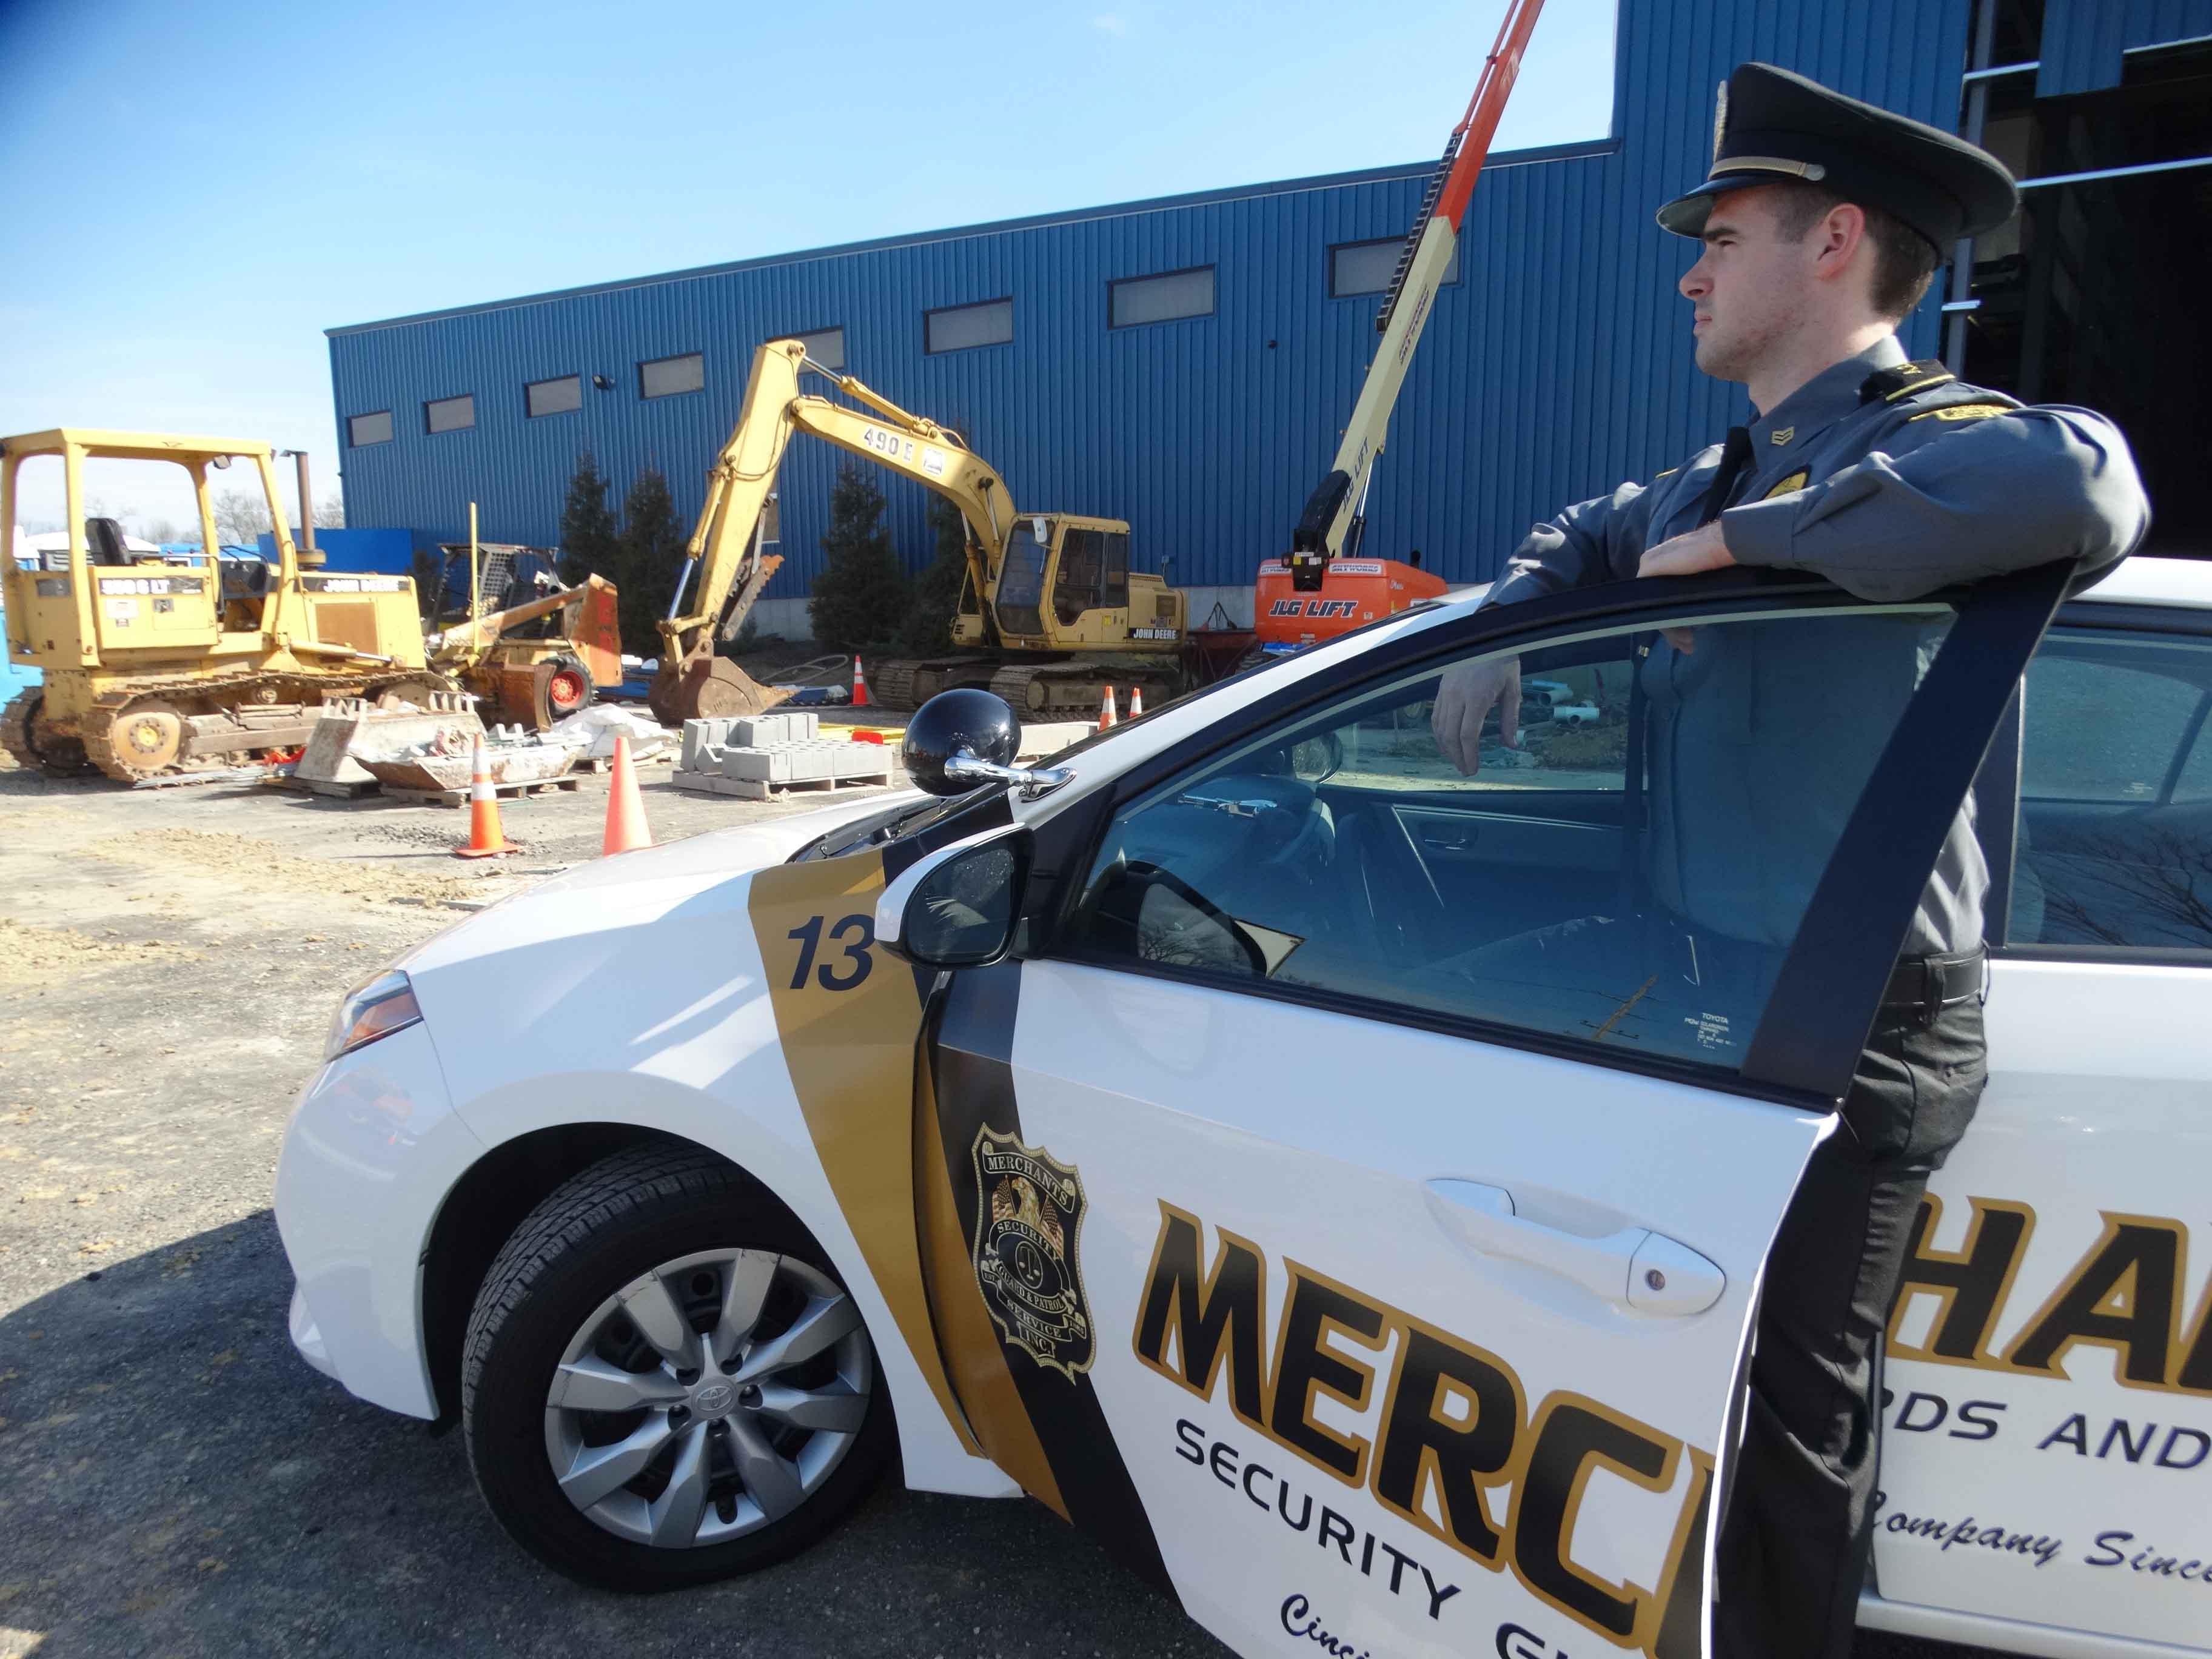 Merchants Security Guard Amp Patrol Services 4766 Glendale